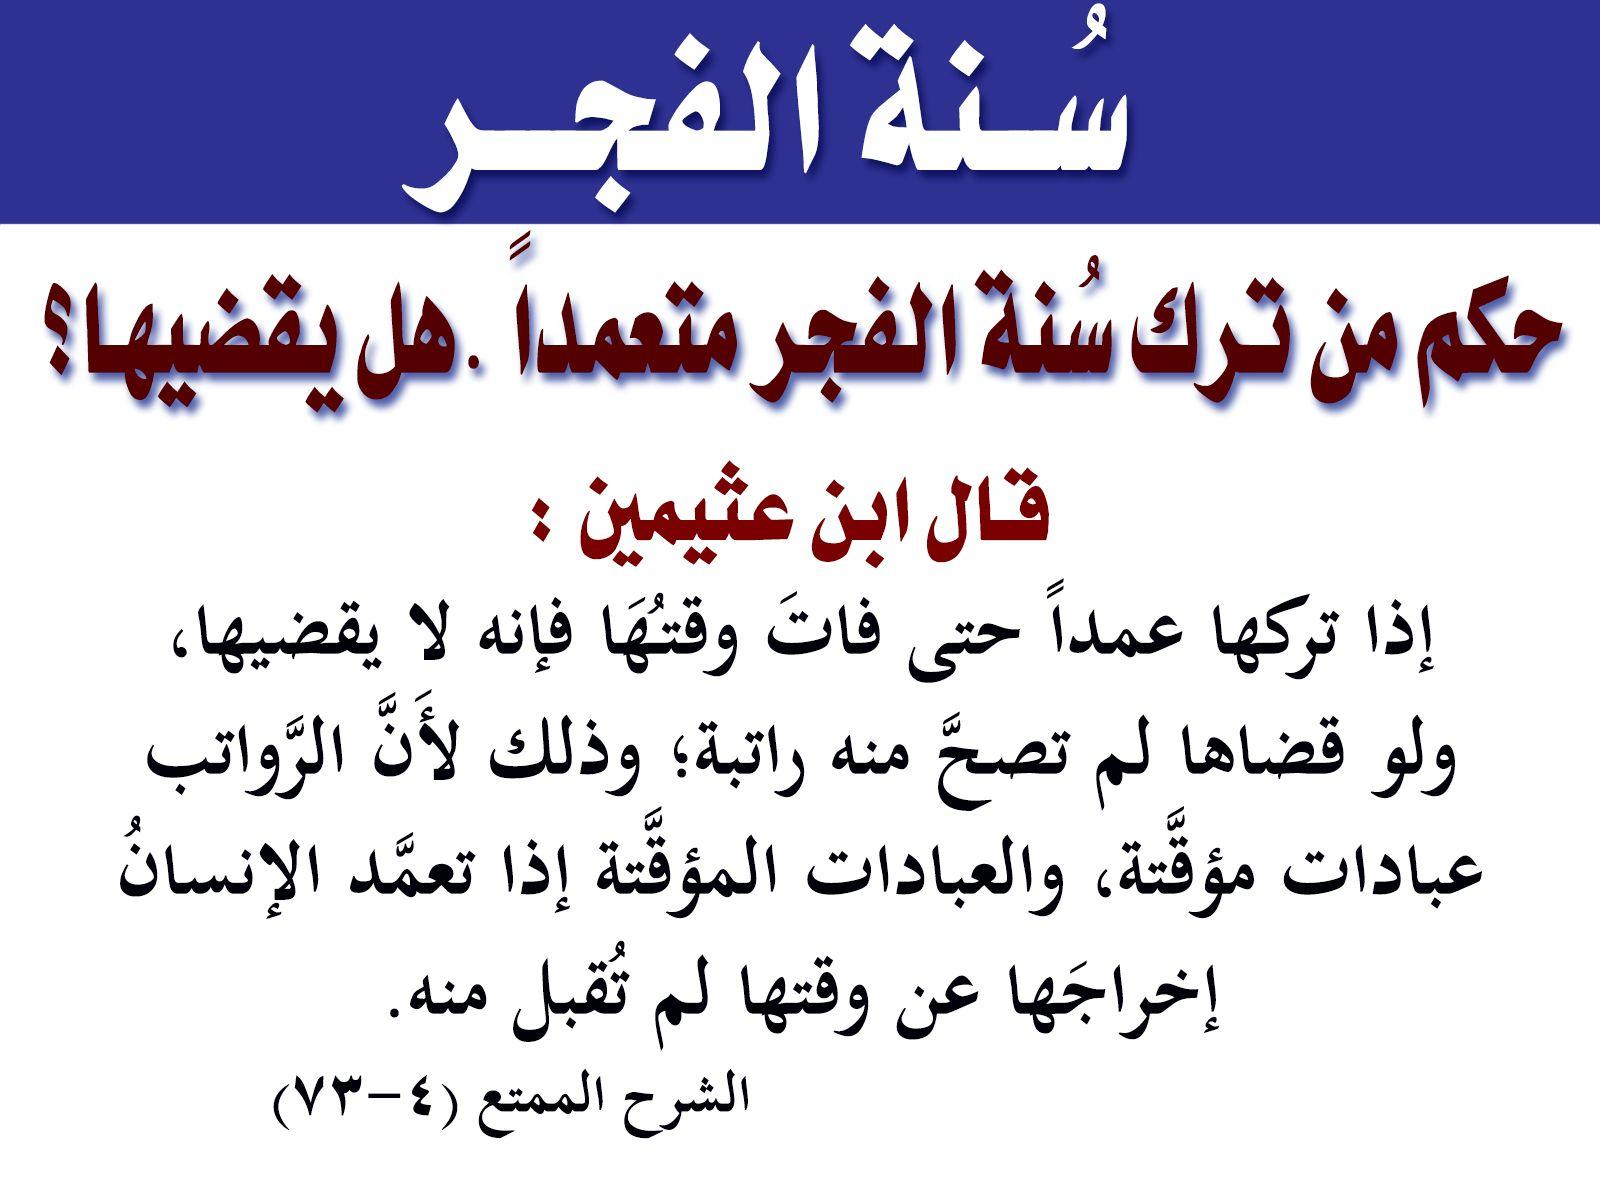 سنة الفجر حكم من تركها عمدا Arabic Quotes Quotes Arabic Calligraphy